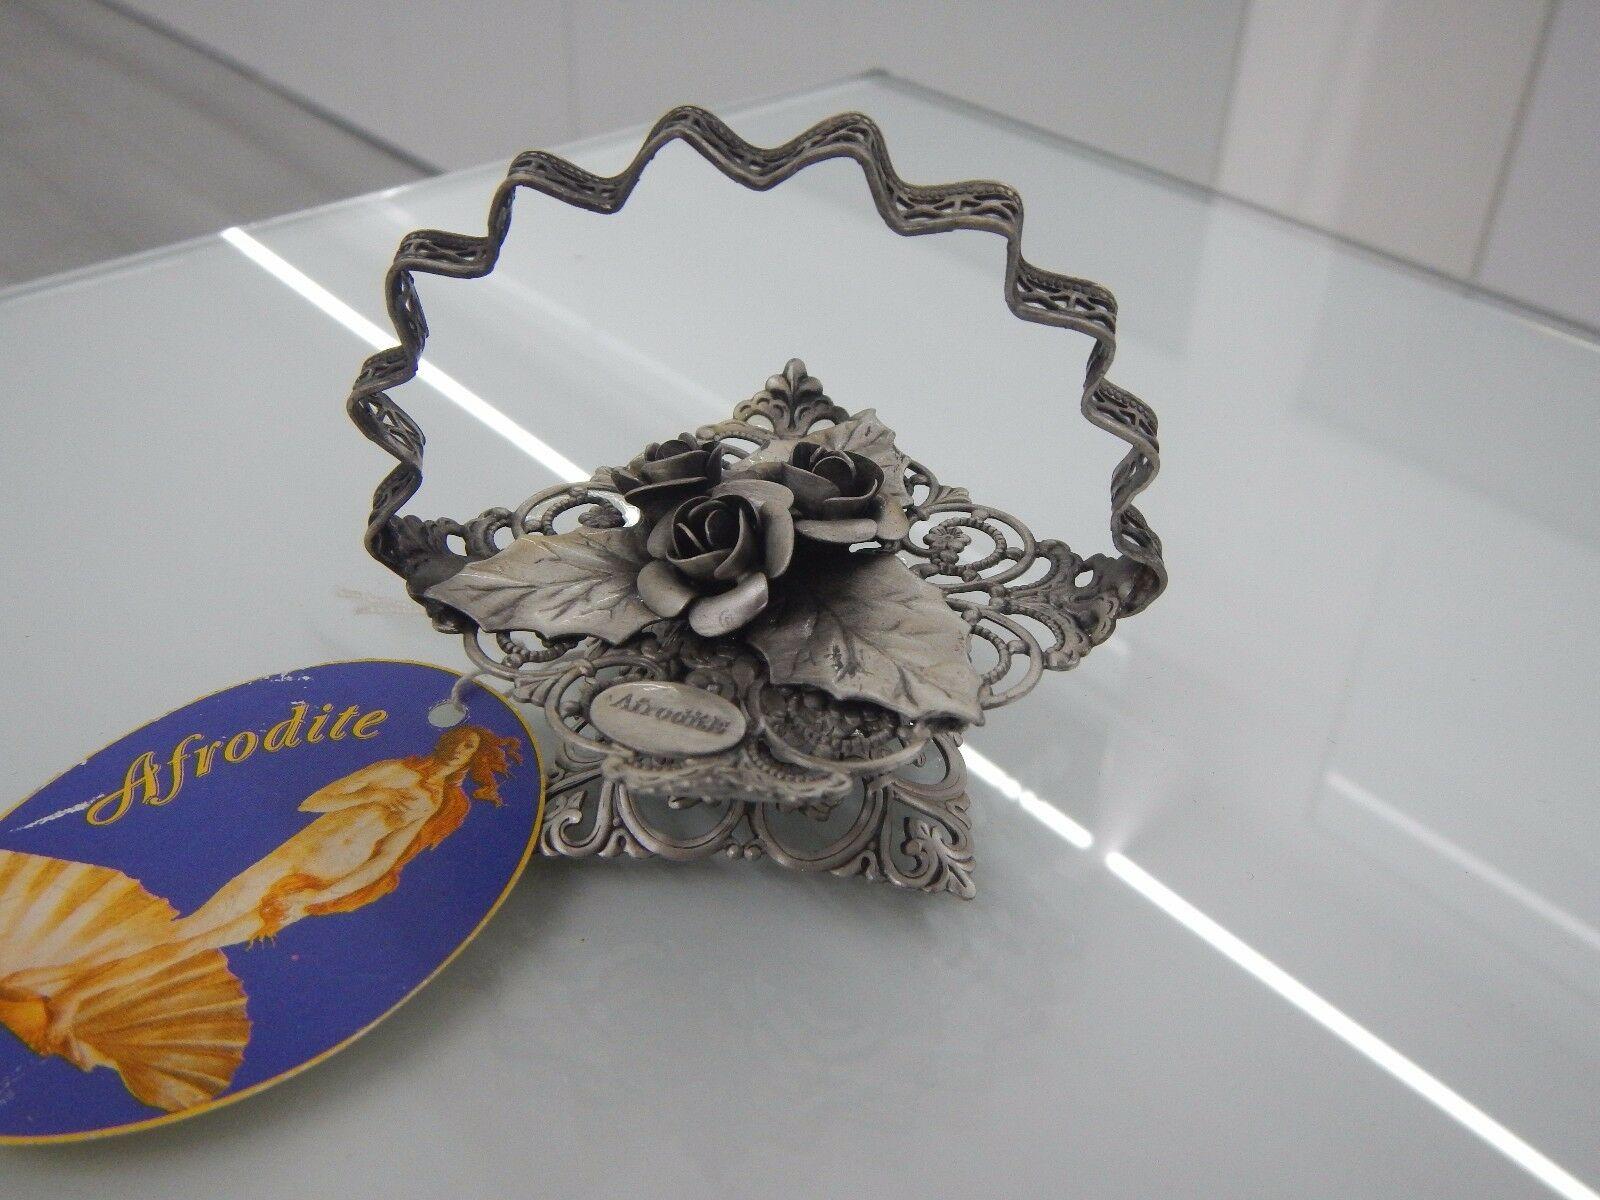 Cestino Vintage Decorazioni vetrine Tableau Mariage Classico Afrodite 139003